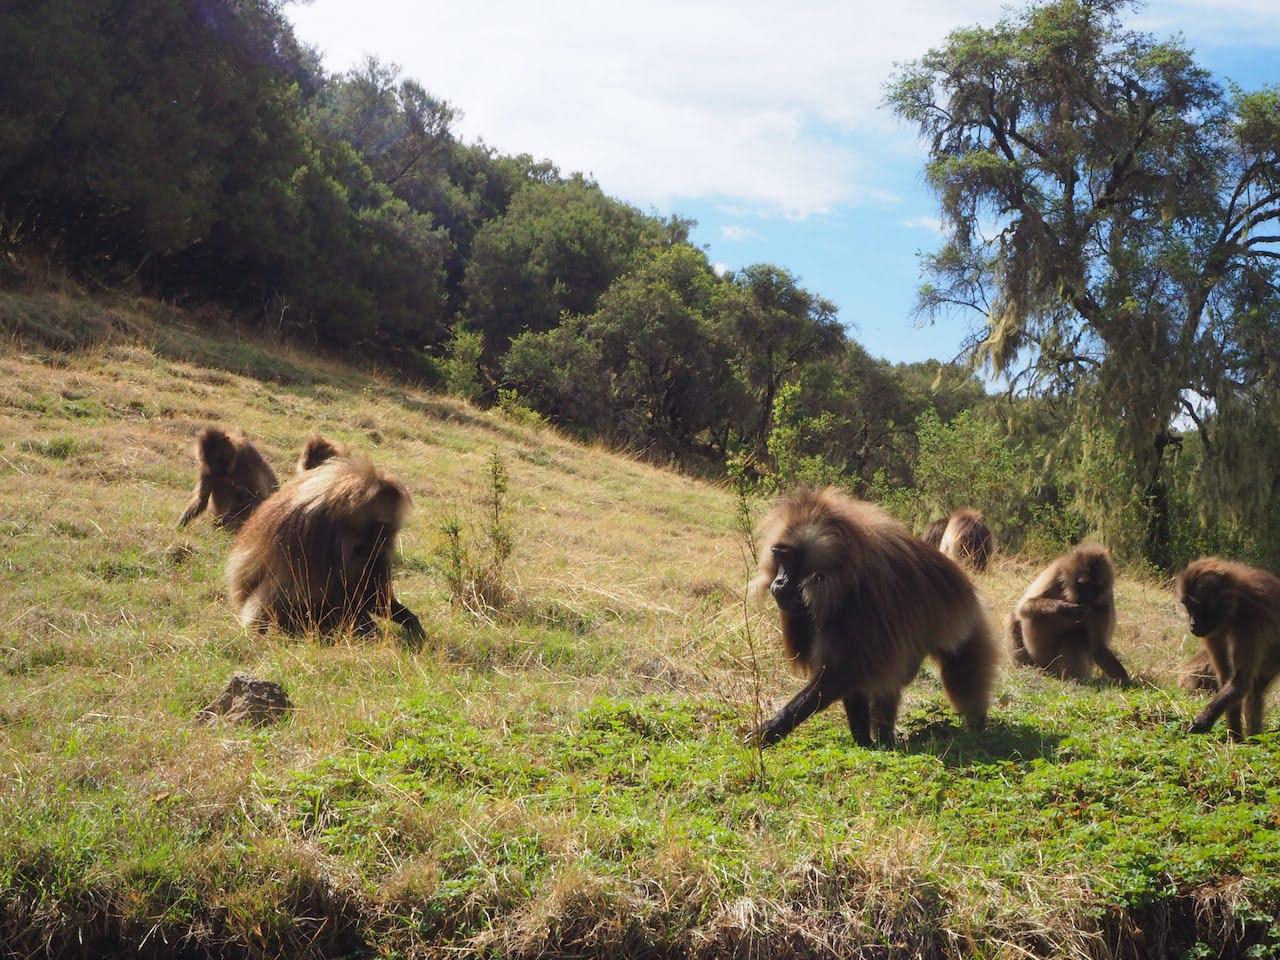 Trekking-Ethiopias-Simien-Mountains-Mafia-AK-47s-and-a-Park-at-Risk-Gelada-baboons